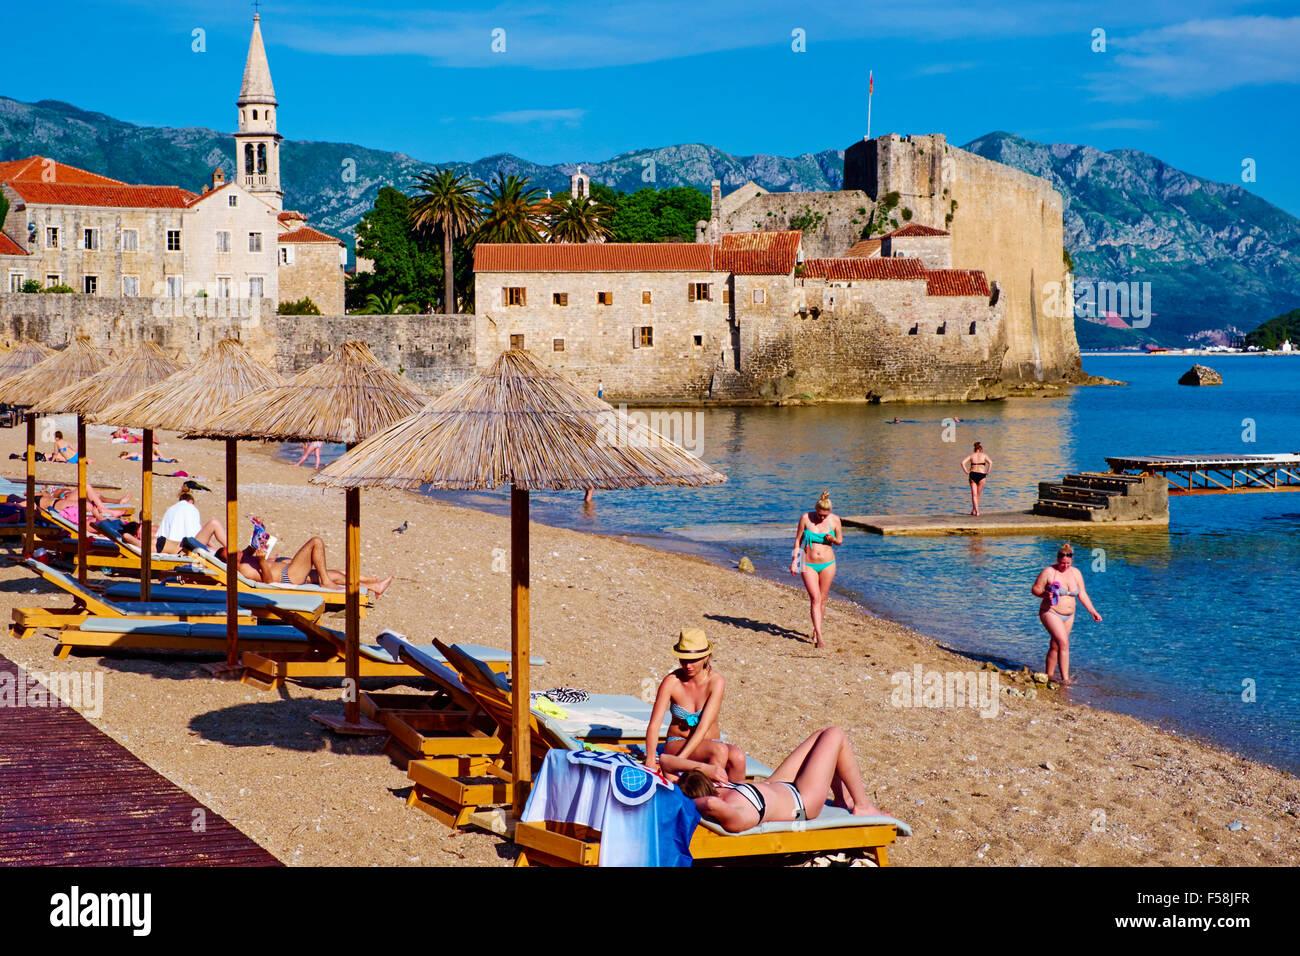 Montenegro, Adriatic coast, old city of Budva, Stari Grad - Stock Image